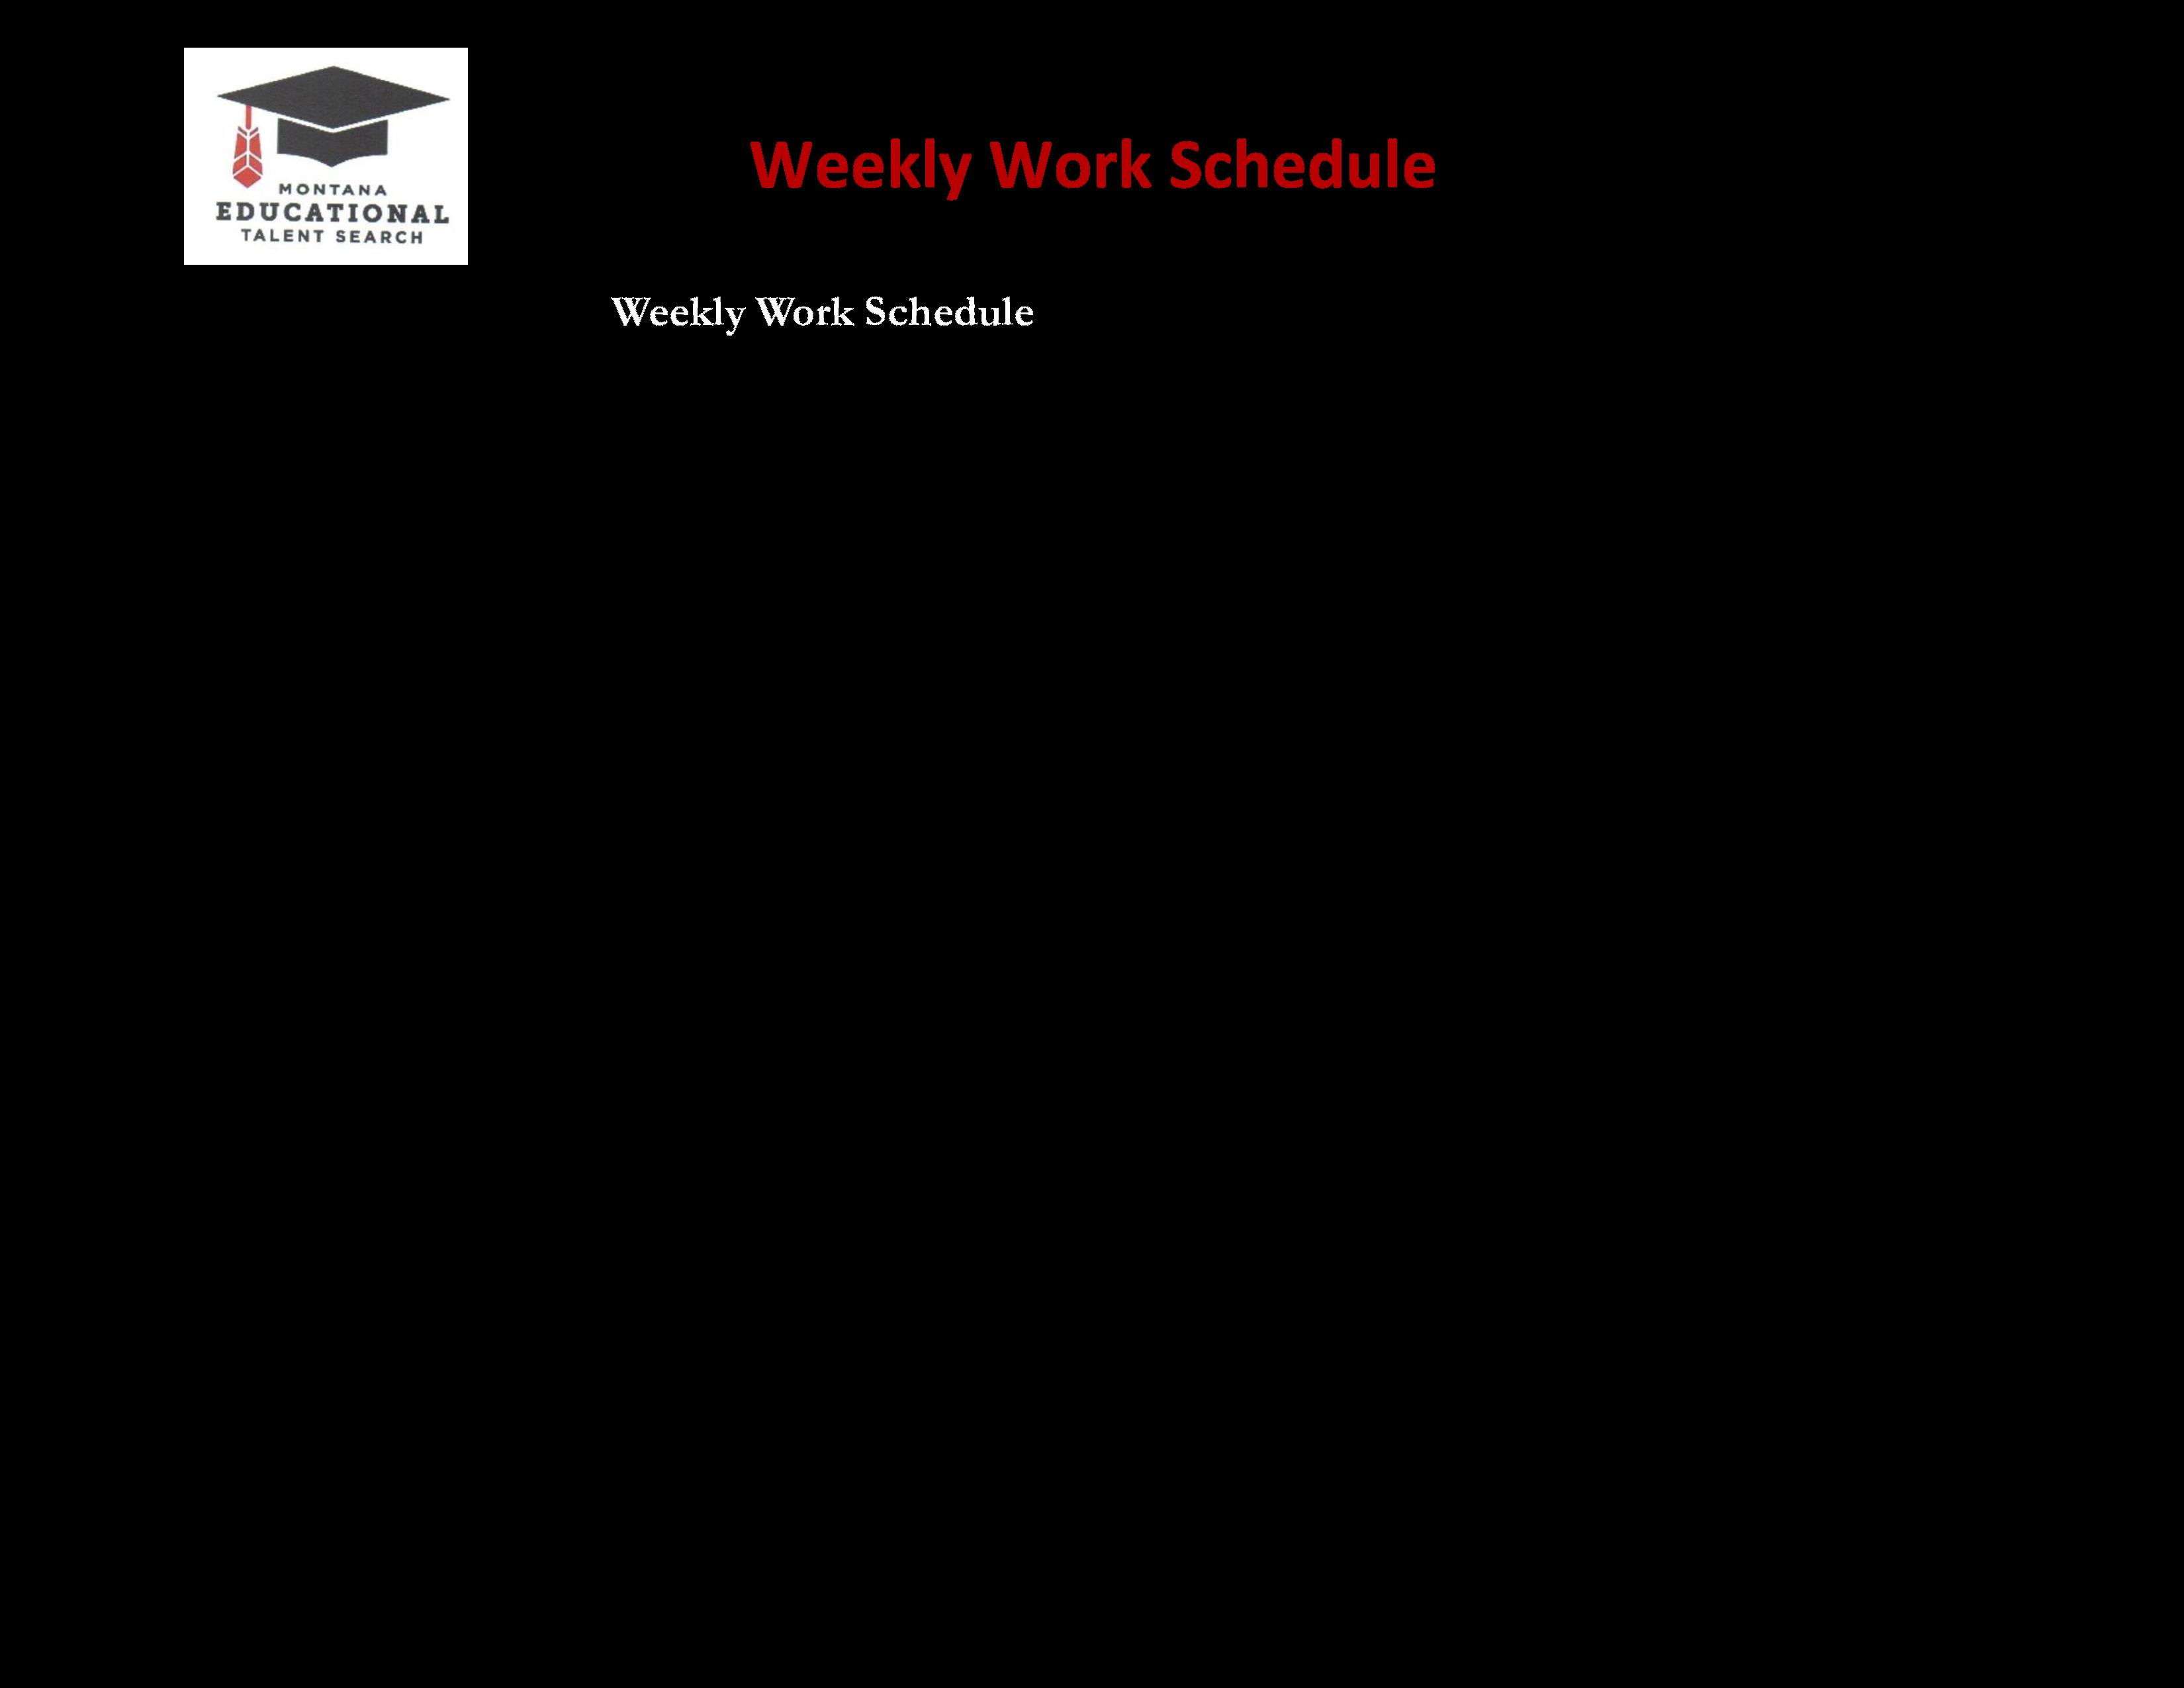 Weekly Work Schedule Templates At Allbusinesstemplates Com